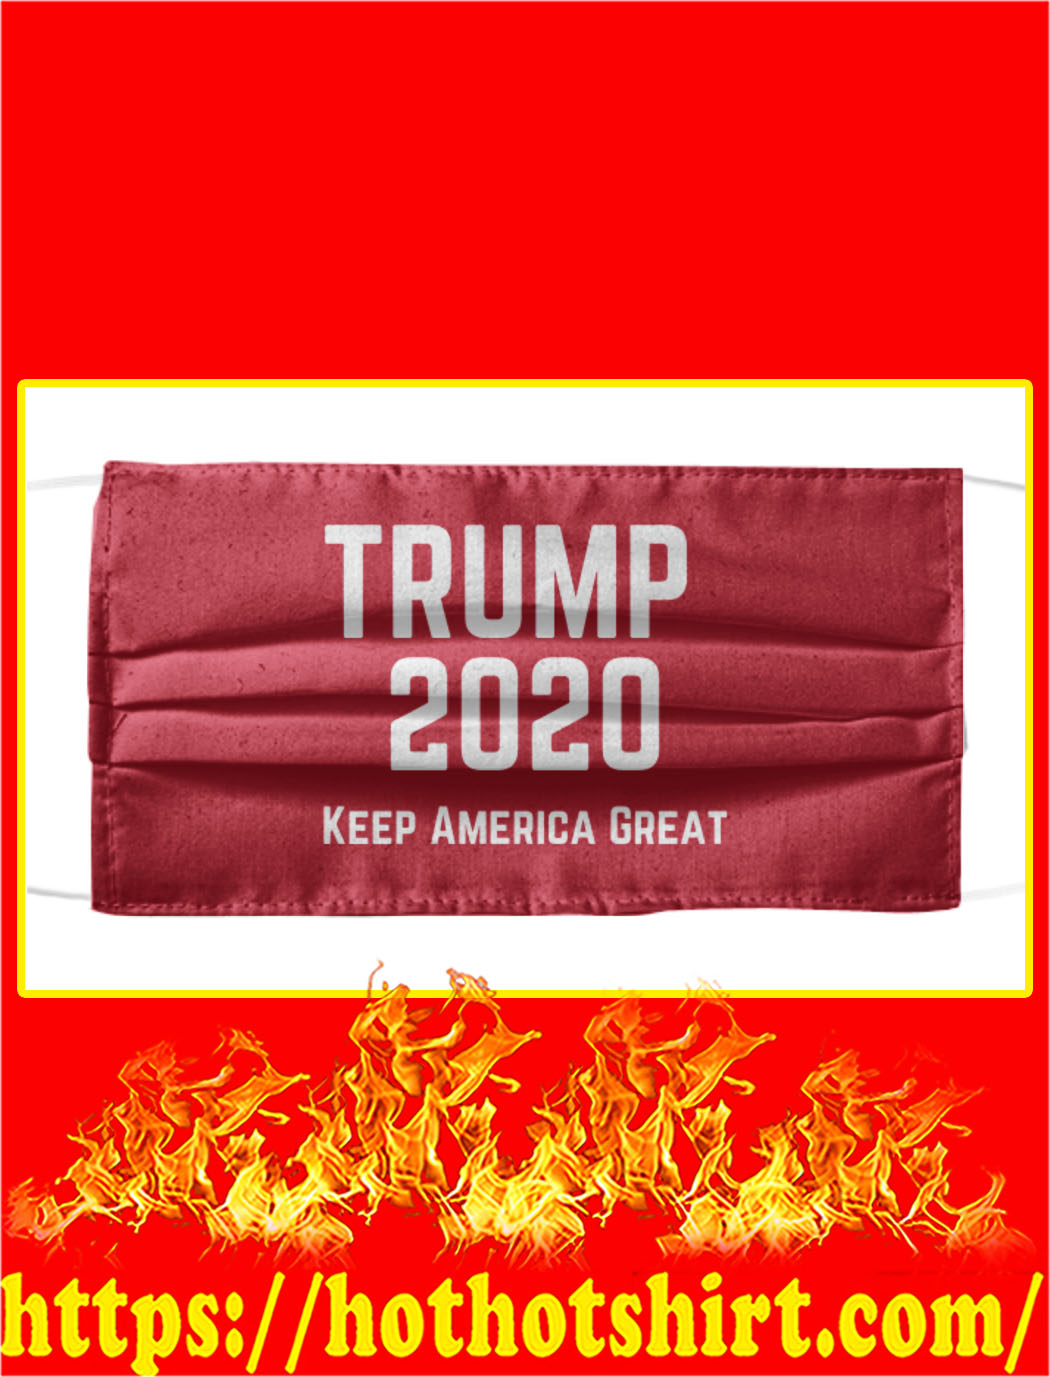 Trump 2020 keep america great face mask